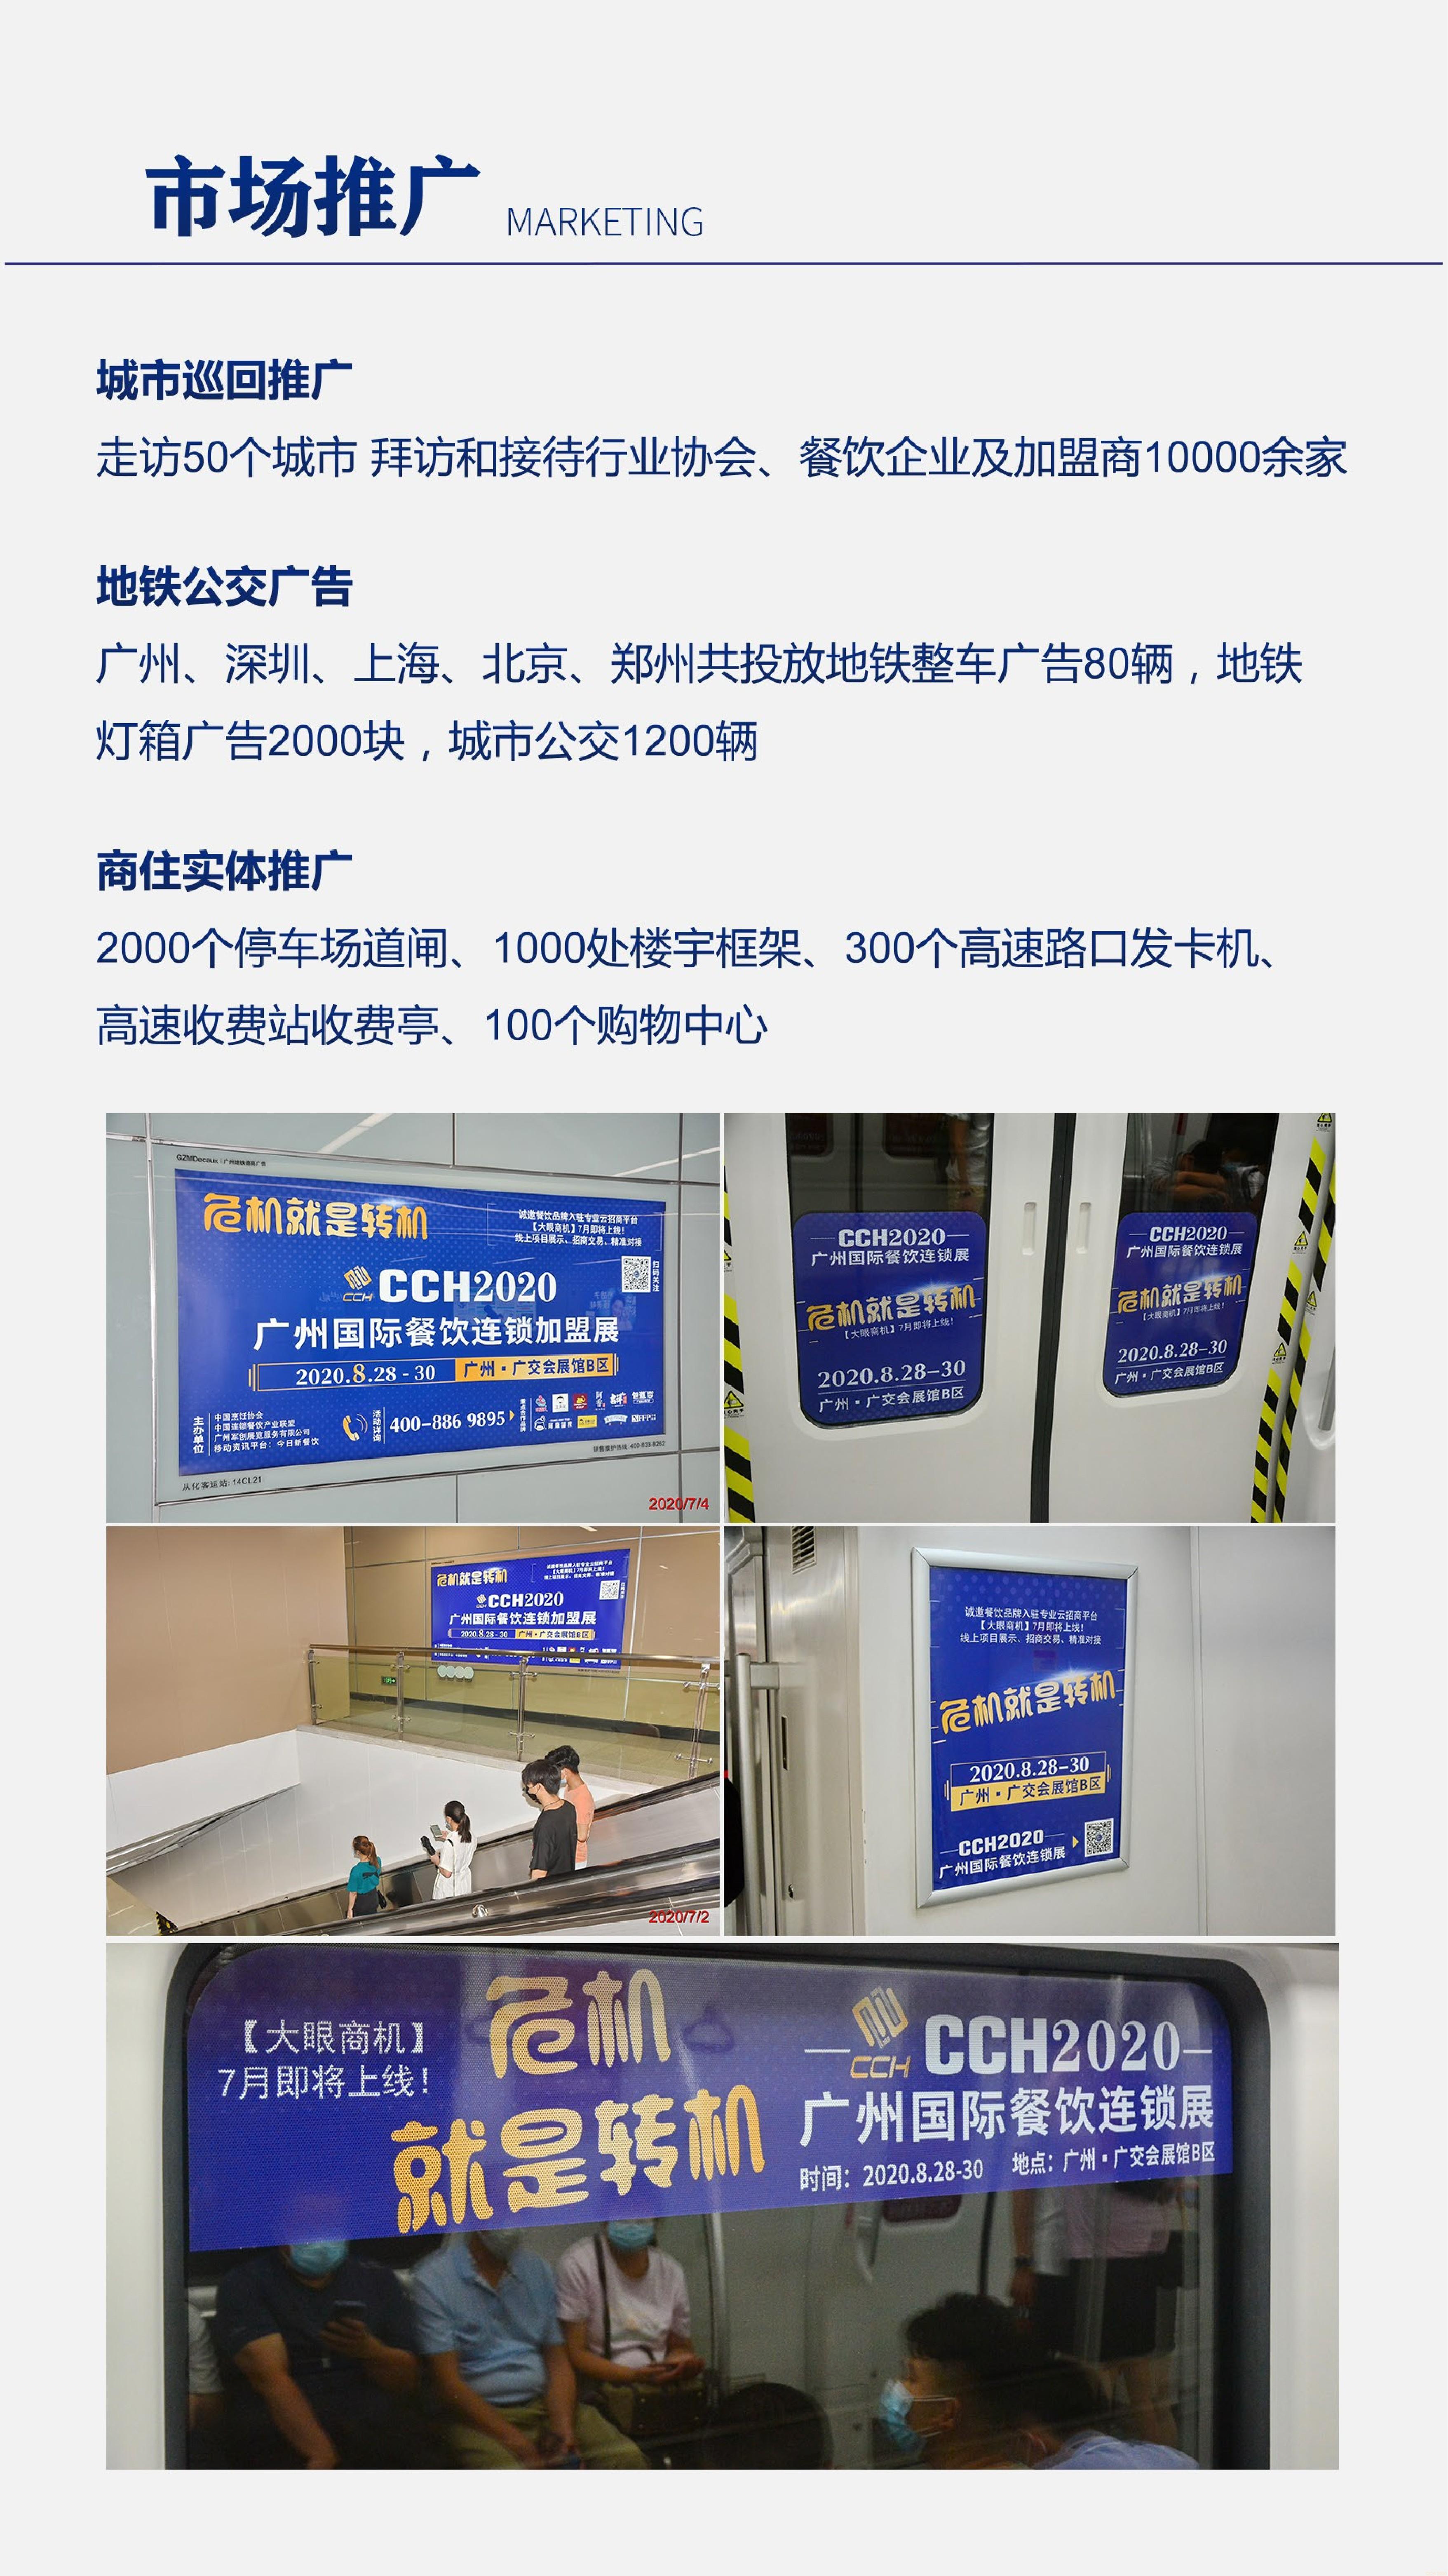 CCH2021-餐饮邀请函·赵(2)(1)-016.jpg